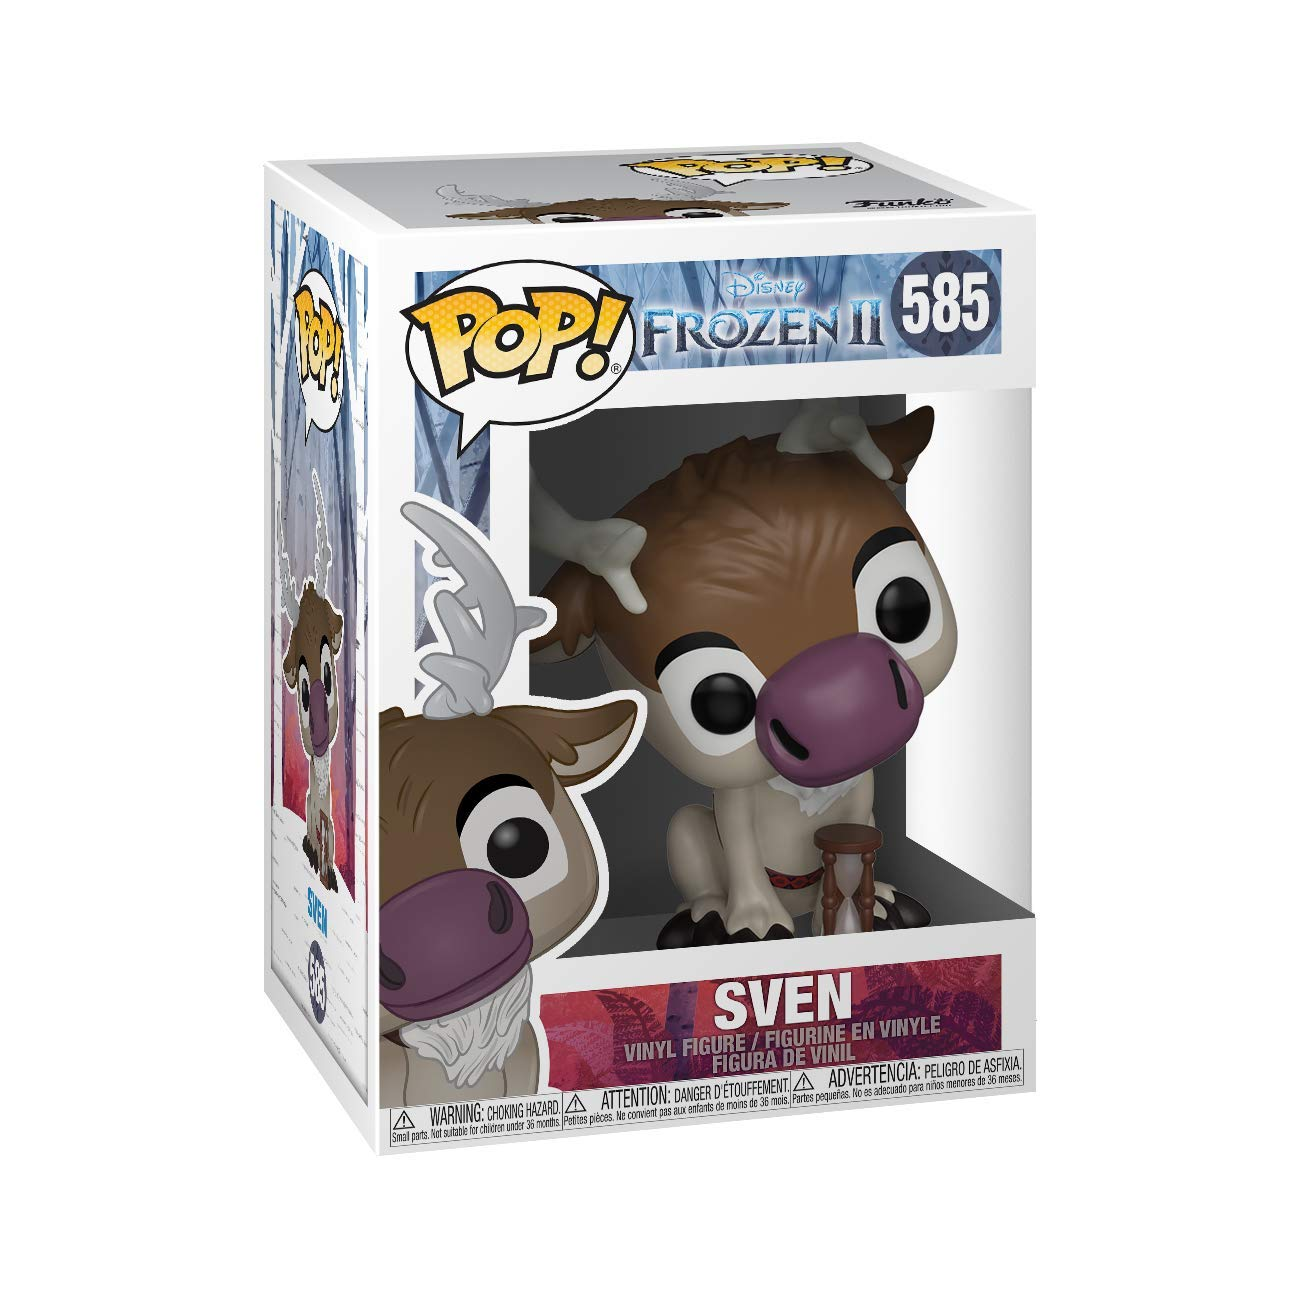 Multicolour Disney: Frozen 2 Funko 40884 POP Elsa Collectible Figure